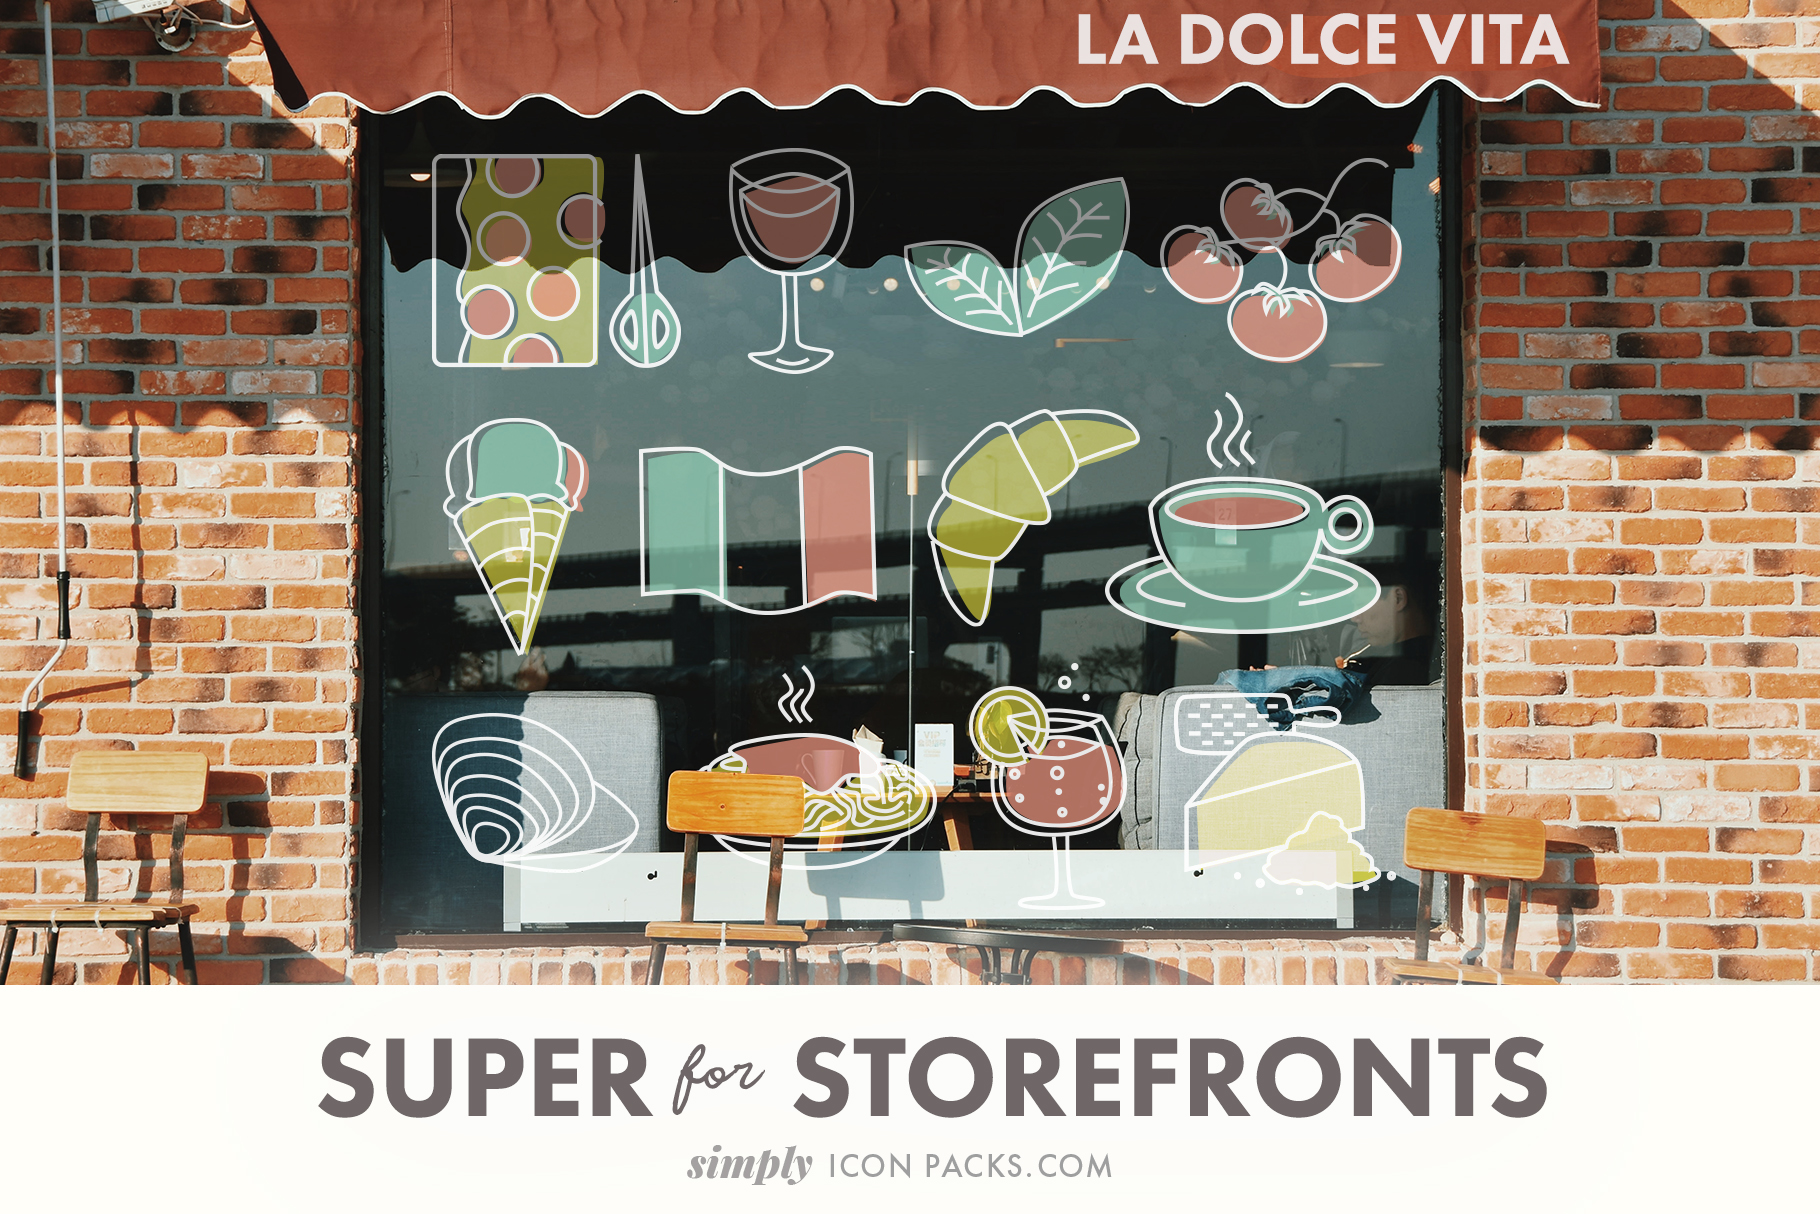 Italian Food and Drink  (SimplyIconPacks.com)